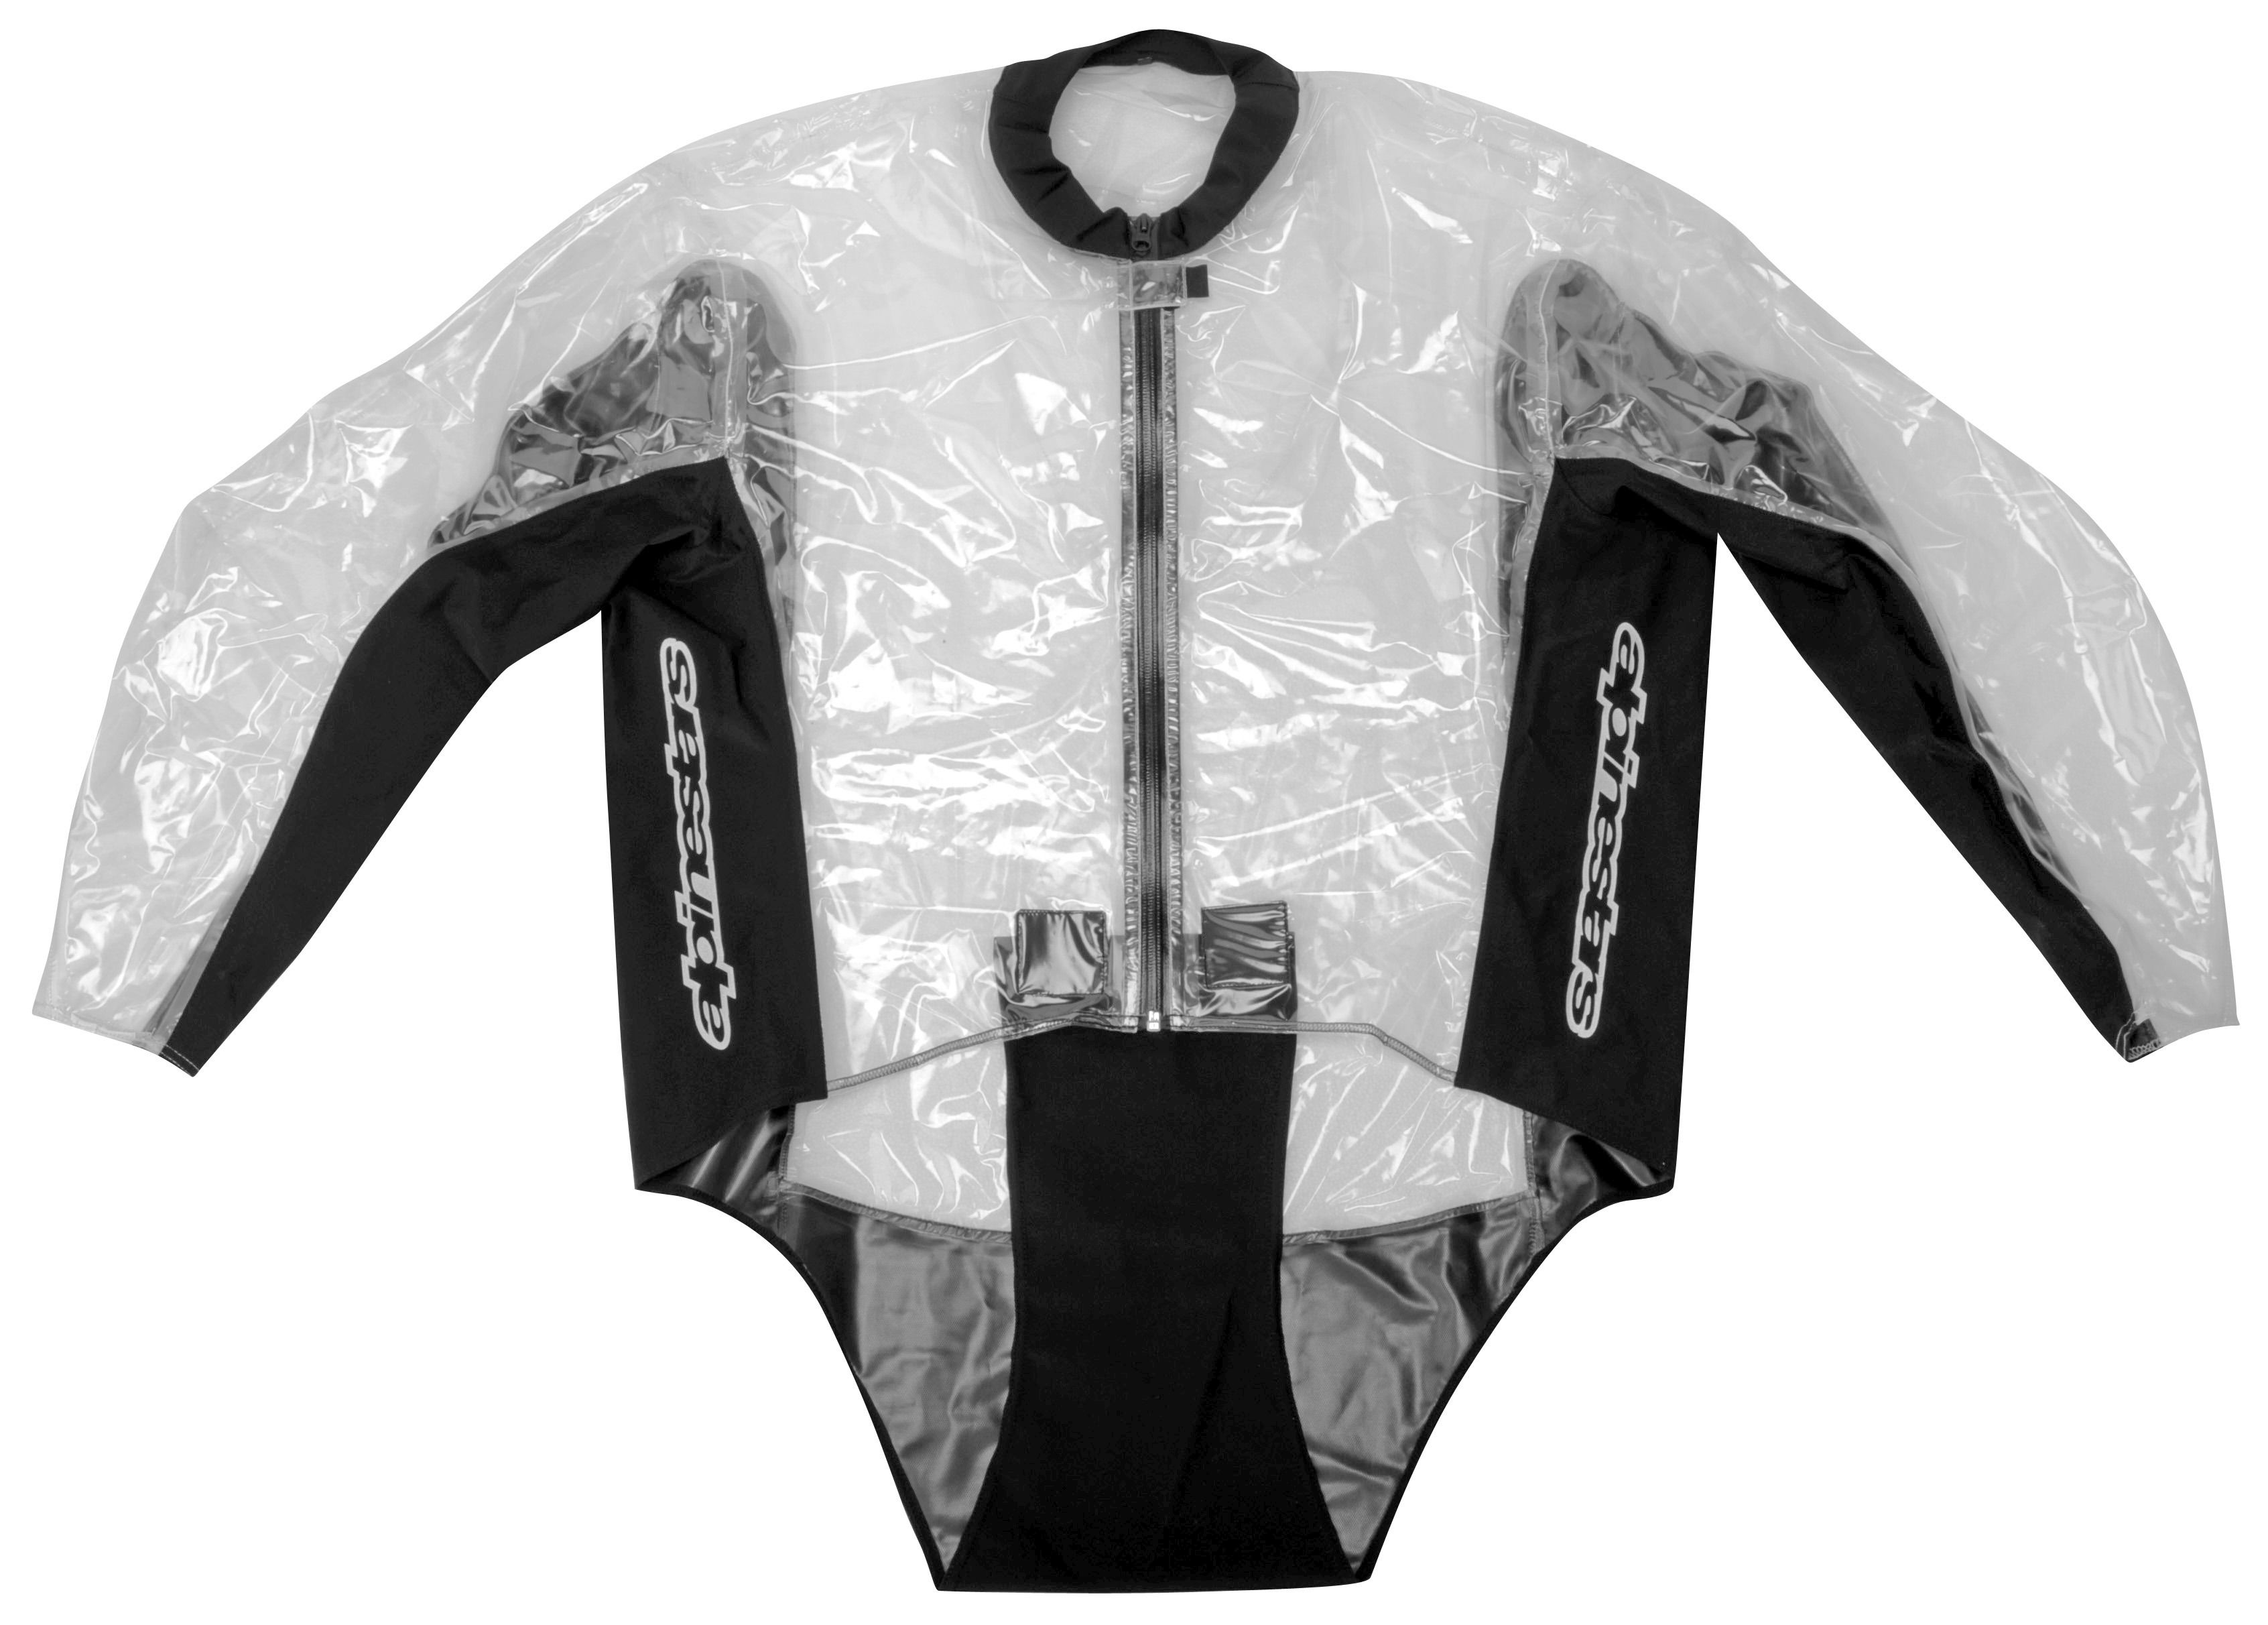 Alpinestars racing rain suit size lg only revzilla for Motor cycle rain gear